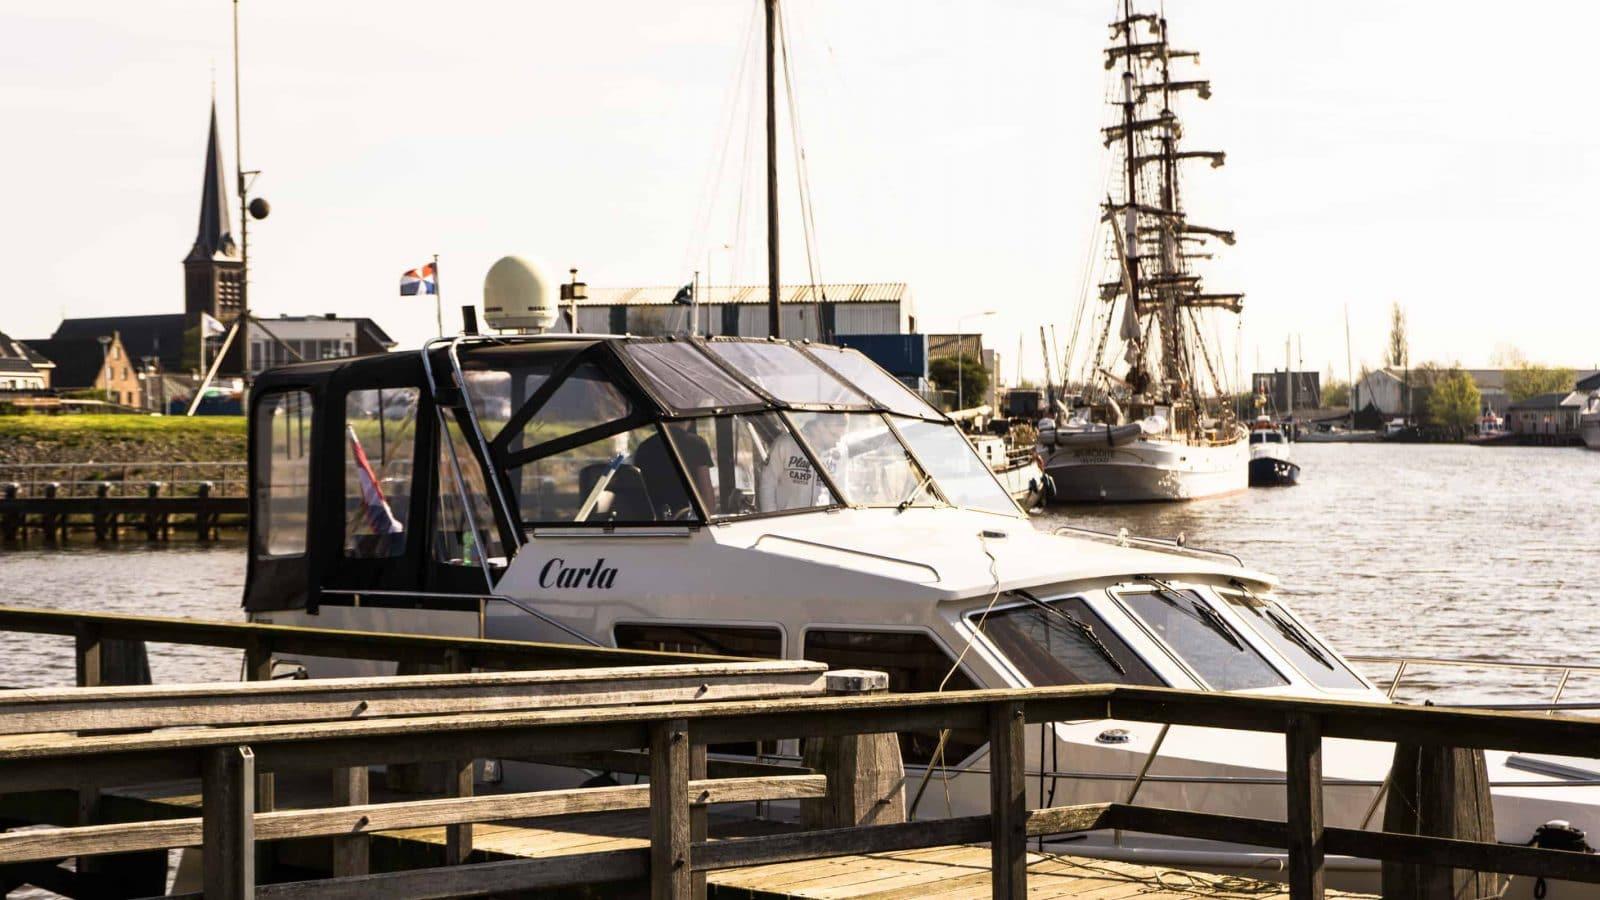 Yachts4U in Holland, Bootsverleih in Holland, Yacht Carla